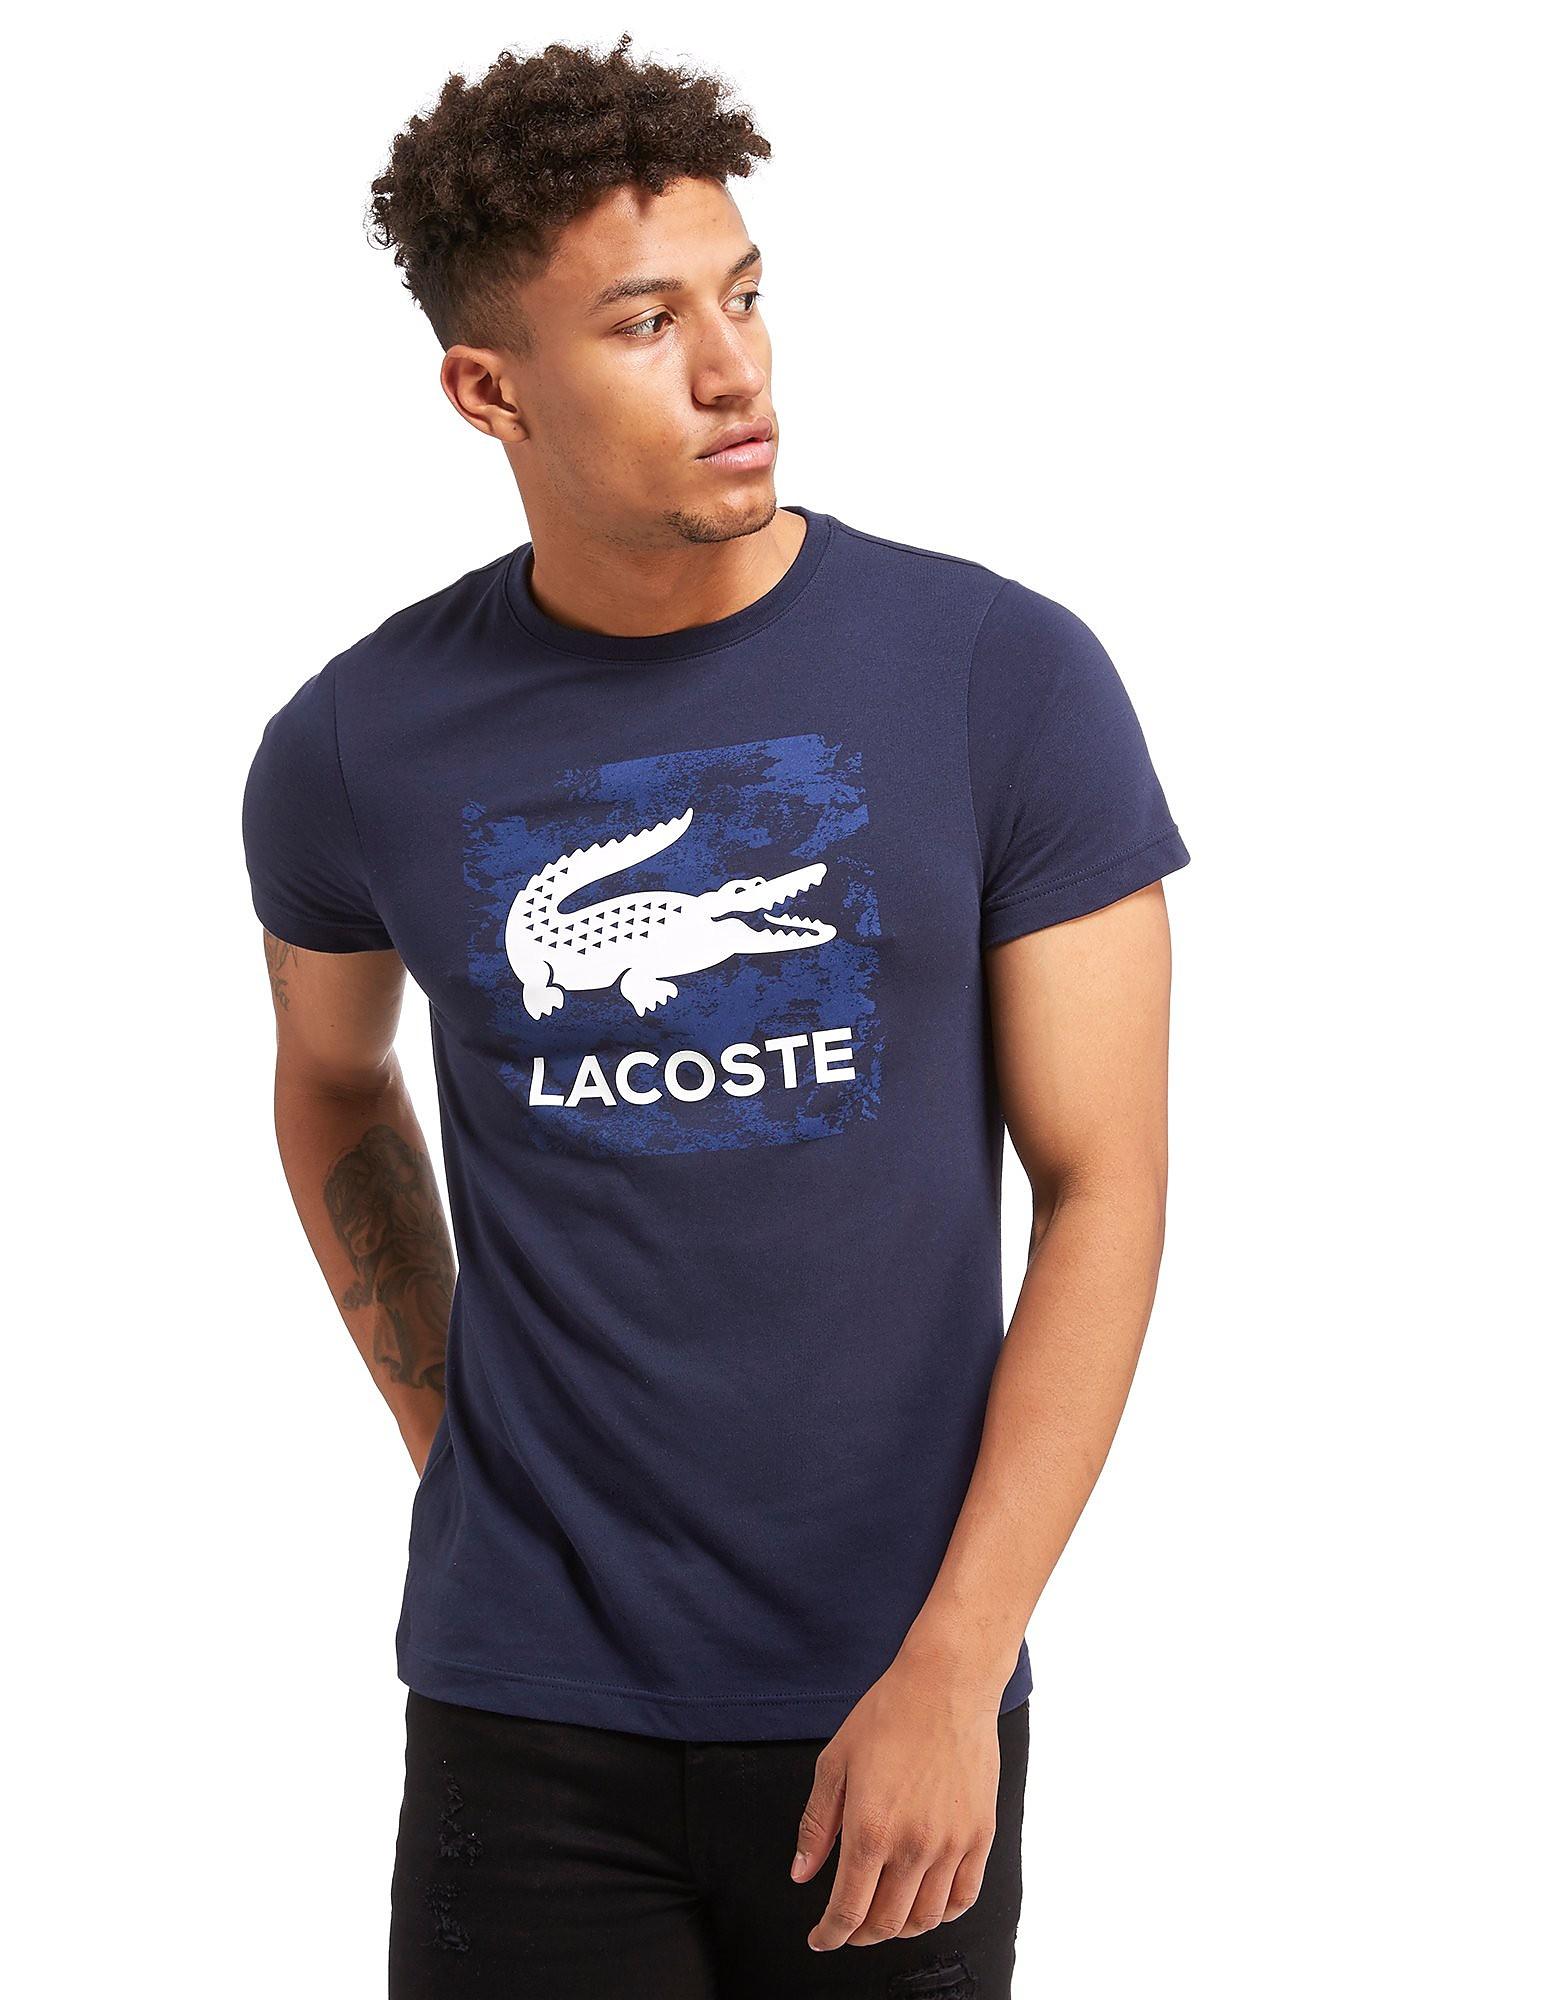 Lacoste Big Croc Print T-Shirt